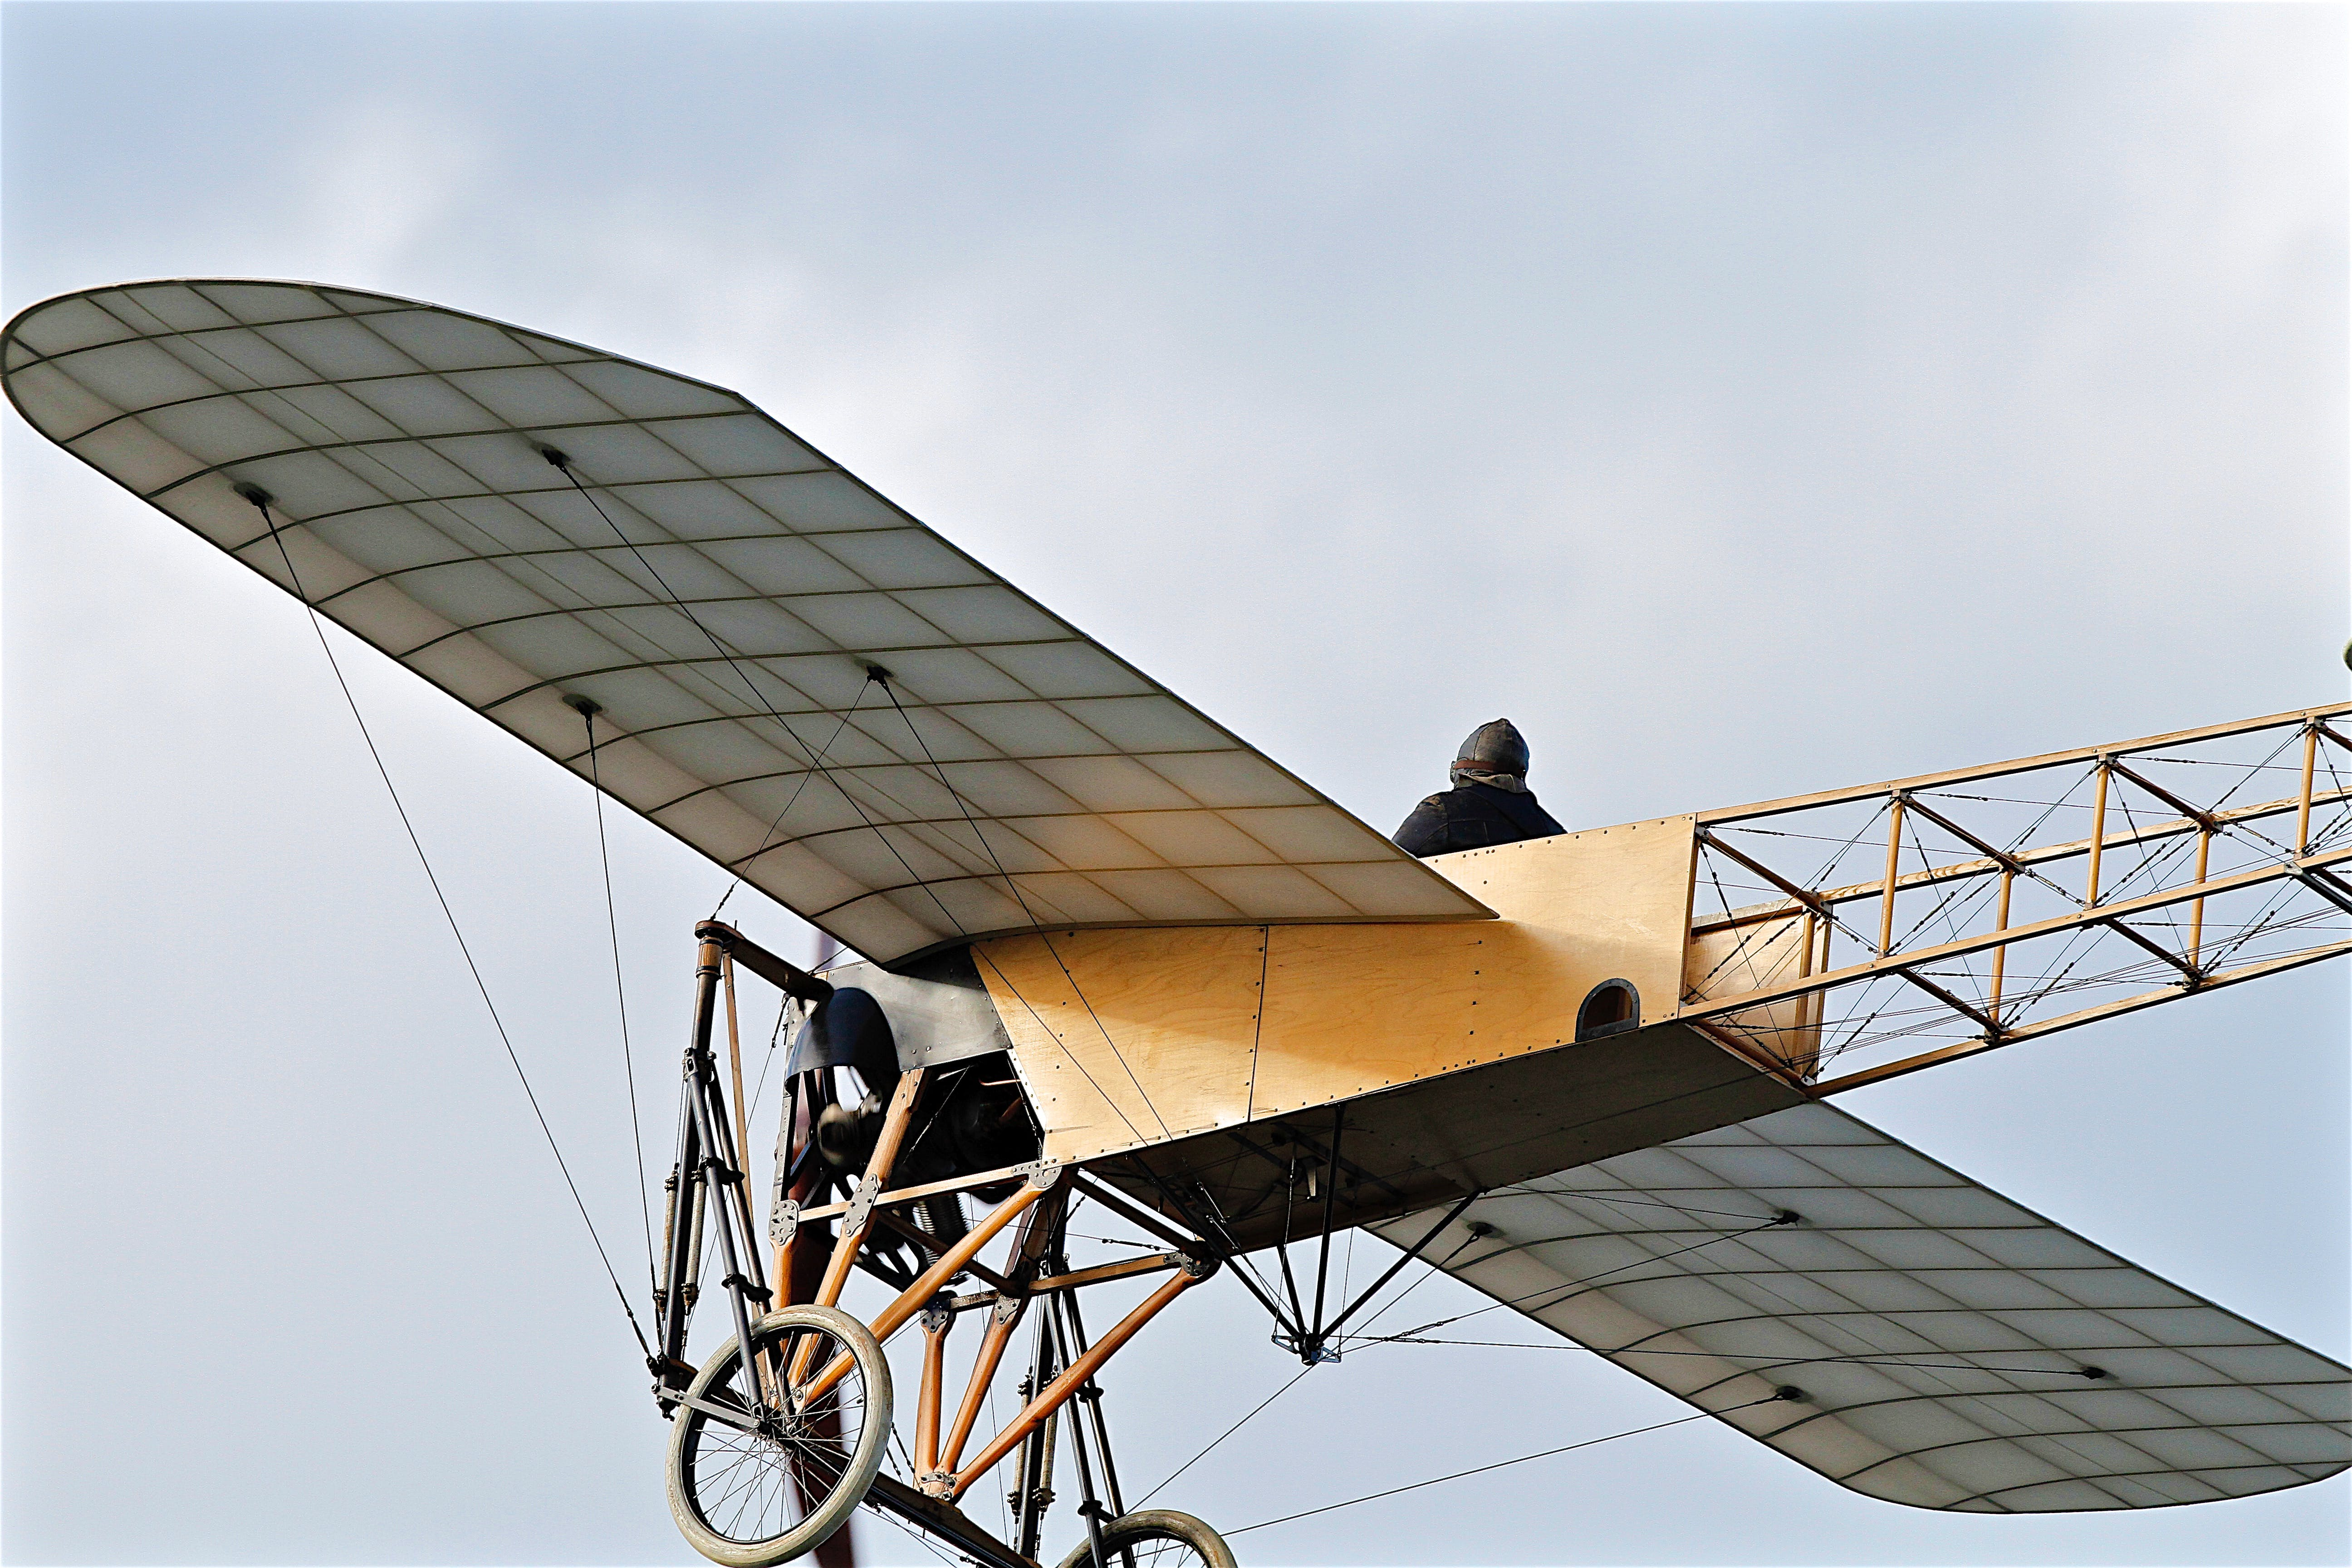 Flying Kitty Hawk